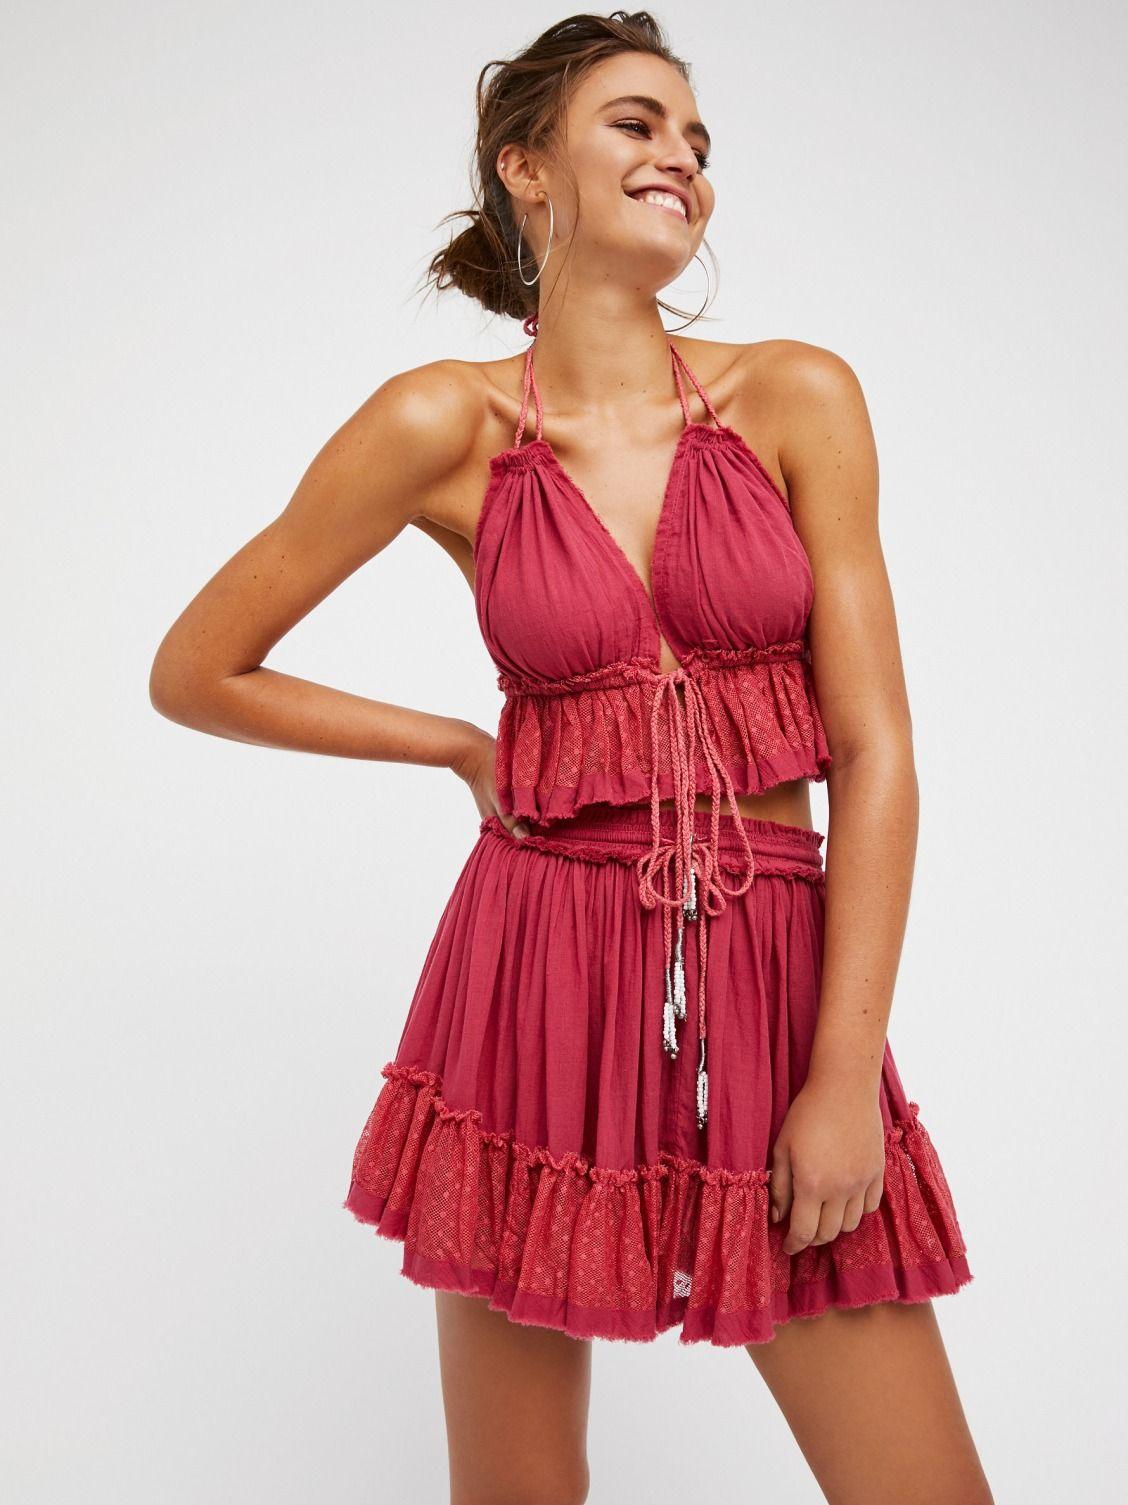 6c378c9dff 200 Degree Set | Dresses | Fashion, Boho outfits, Fashion dresses